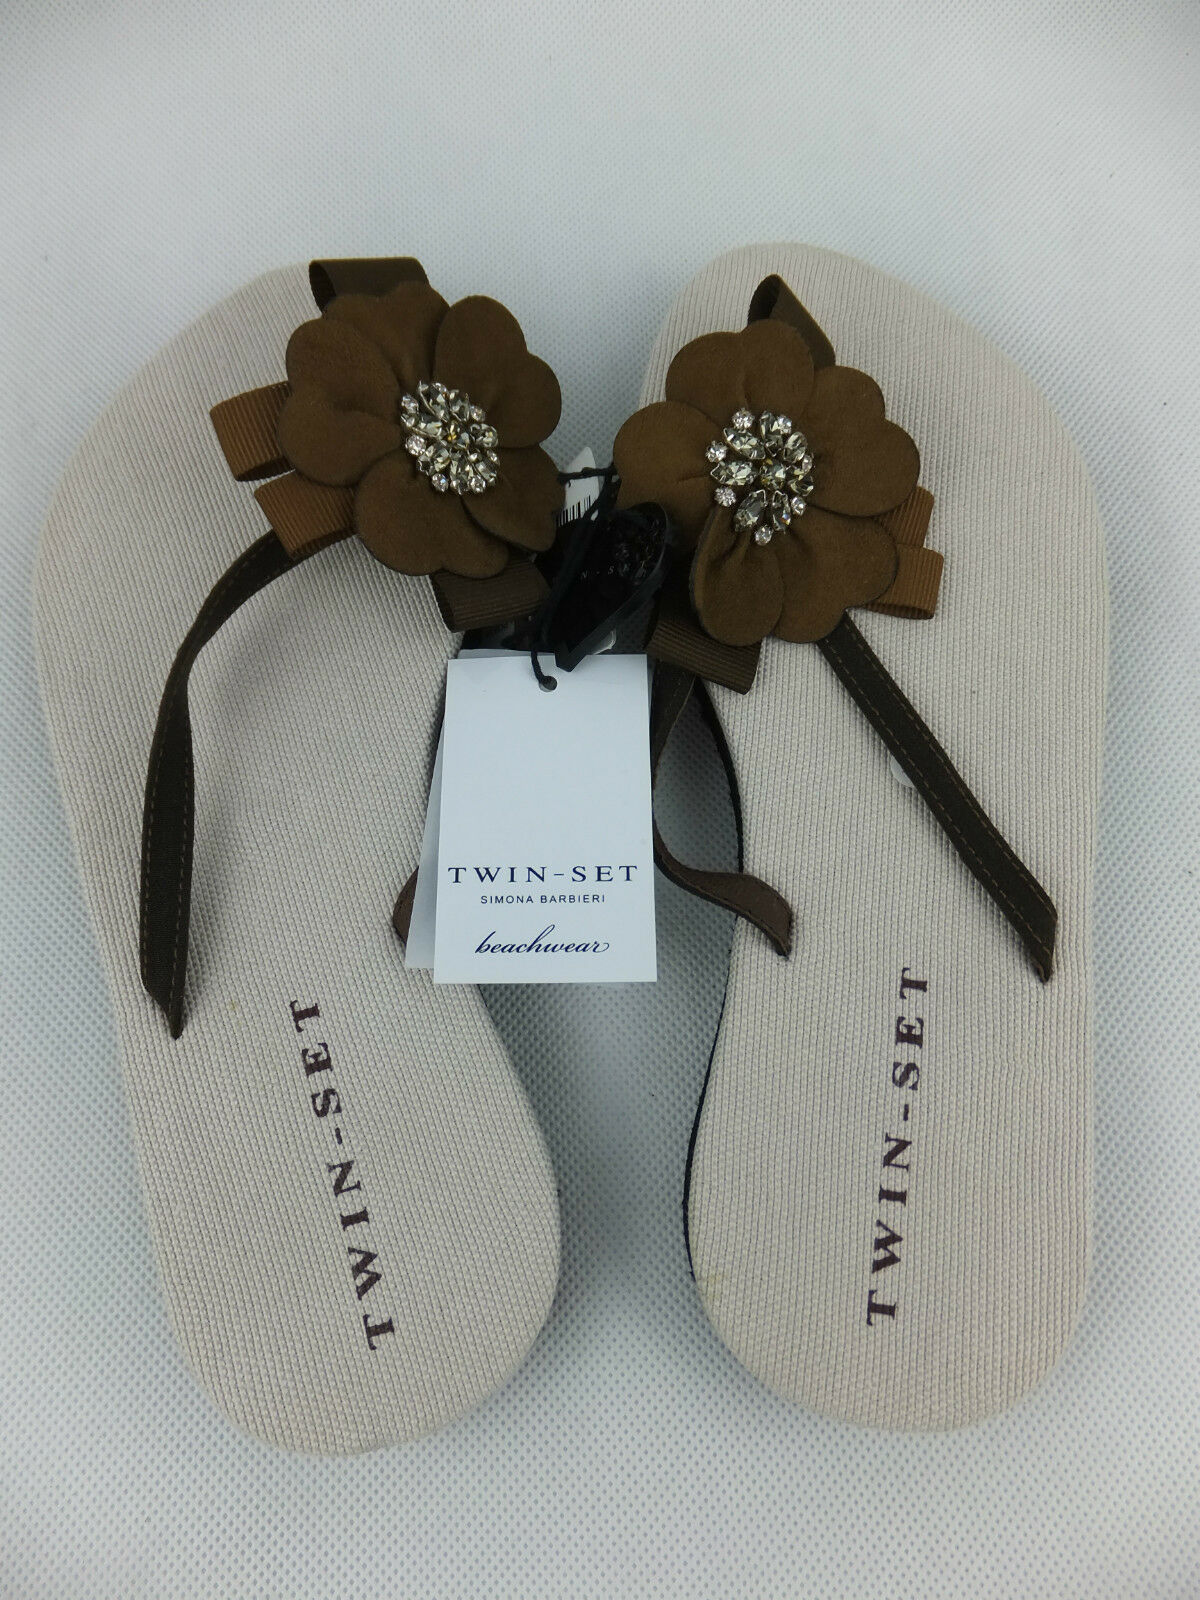 Twin-Set Simona Barbieri Zehensteg Sandalette Etikett 38 braun neu mit Etikett Sandalette 7c7b17